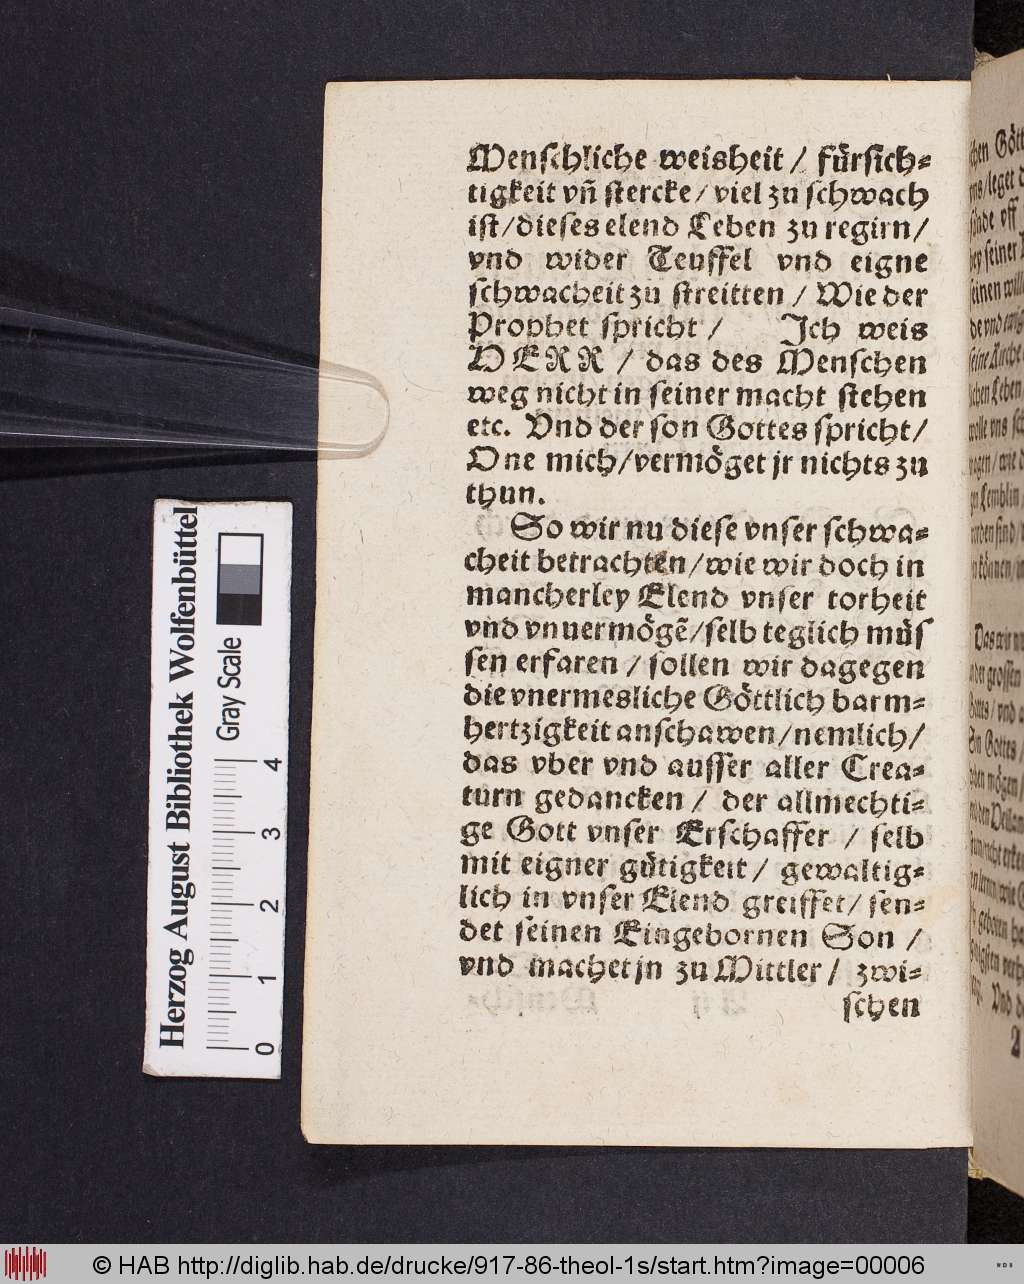 http://diglib.hab.de/drucke/917-86-theol-1s/00006.jpg